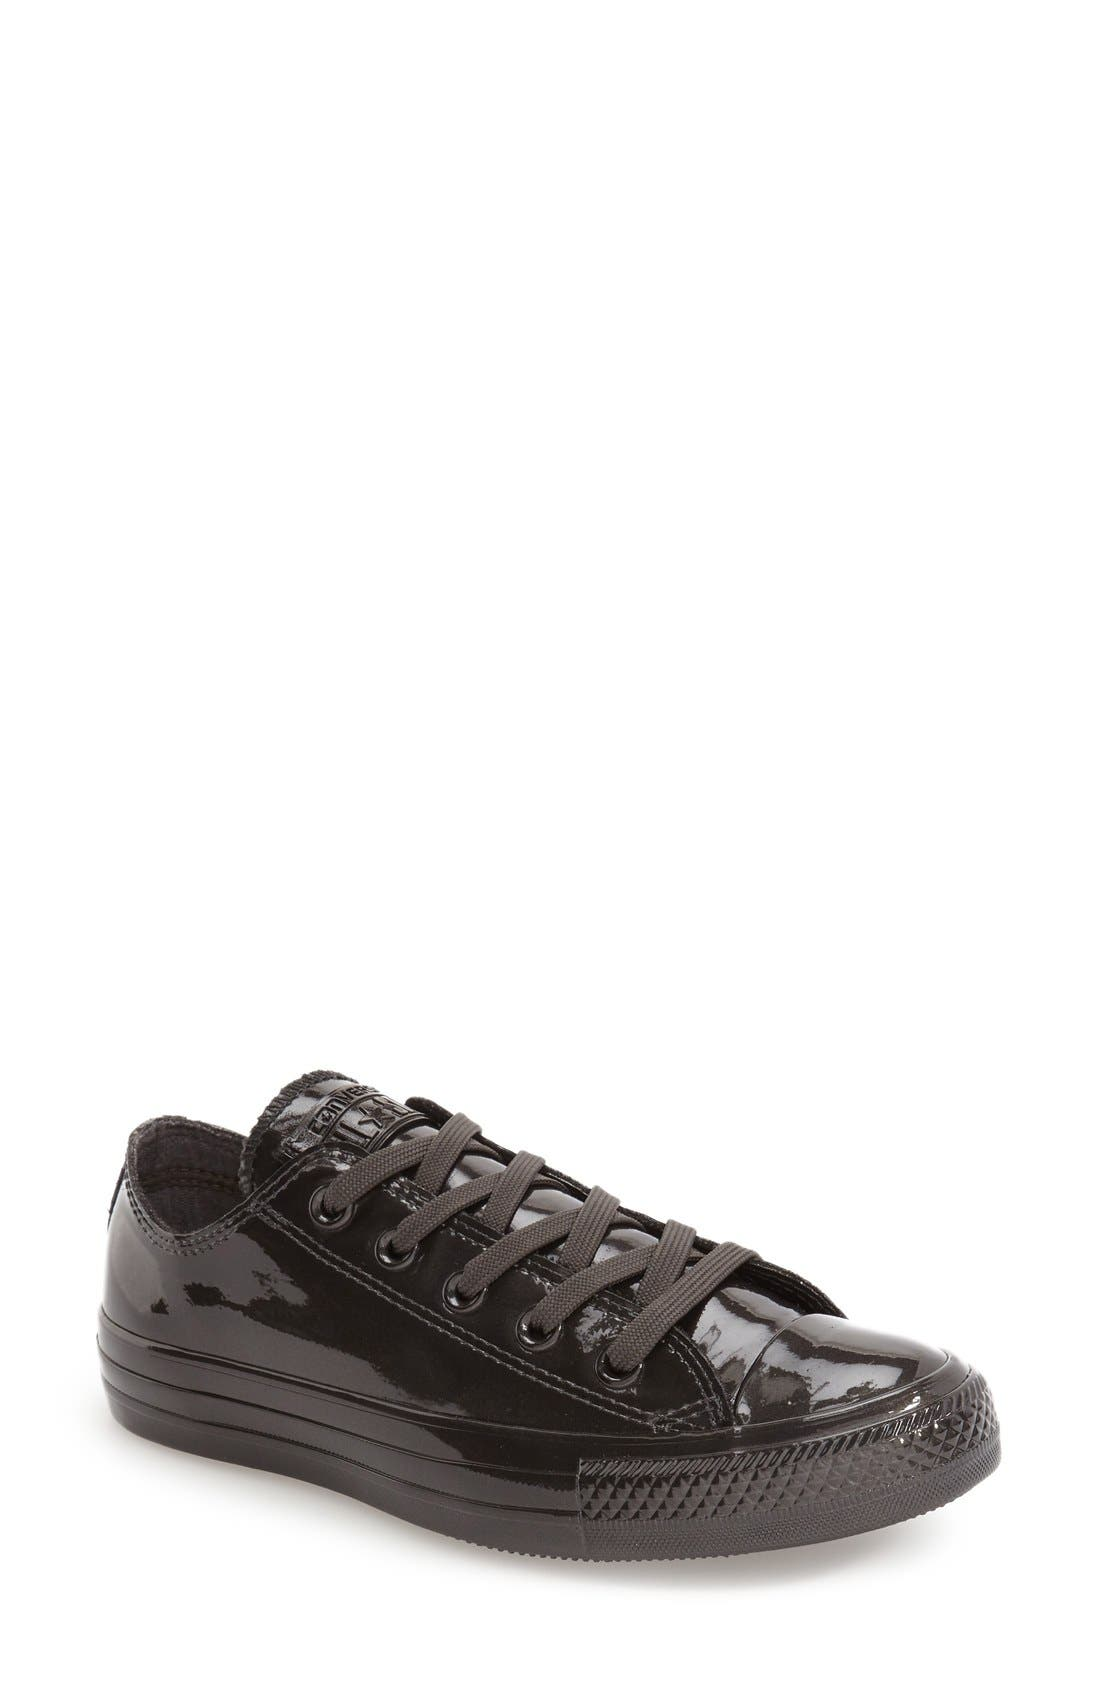 Alternate Image 1 Selected - Converse Chuck Taylor® All Star® Metallic Water Repellent Low Top Sneaker (Women)